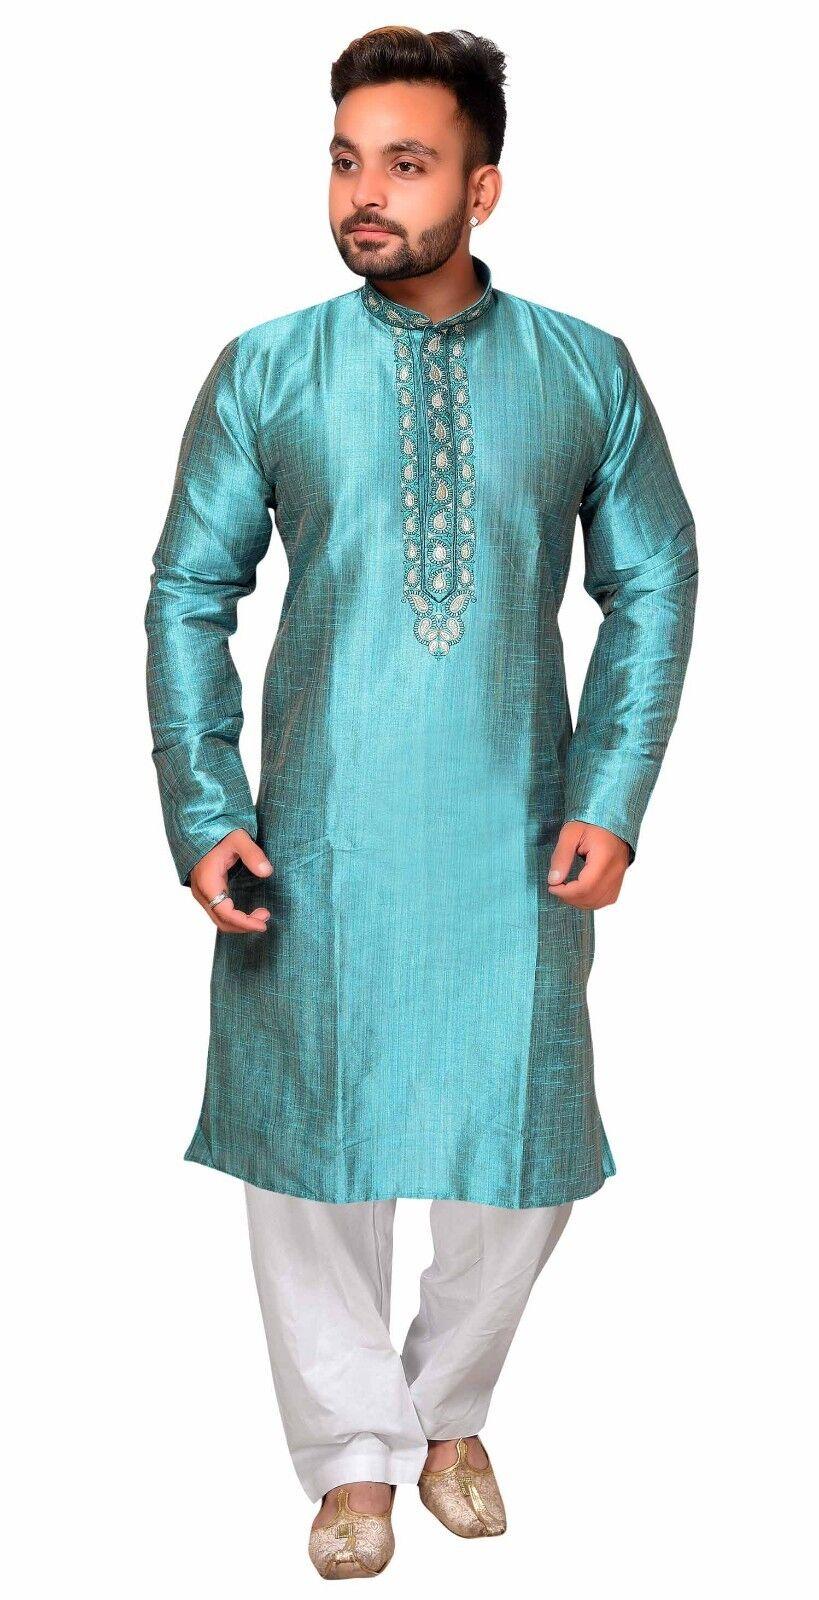 Men's South Asian Kurta Shalwar Kameez Pyjama Sherwani Wedding Party Wear 1833